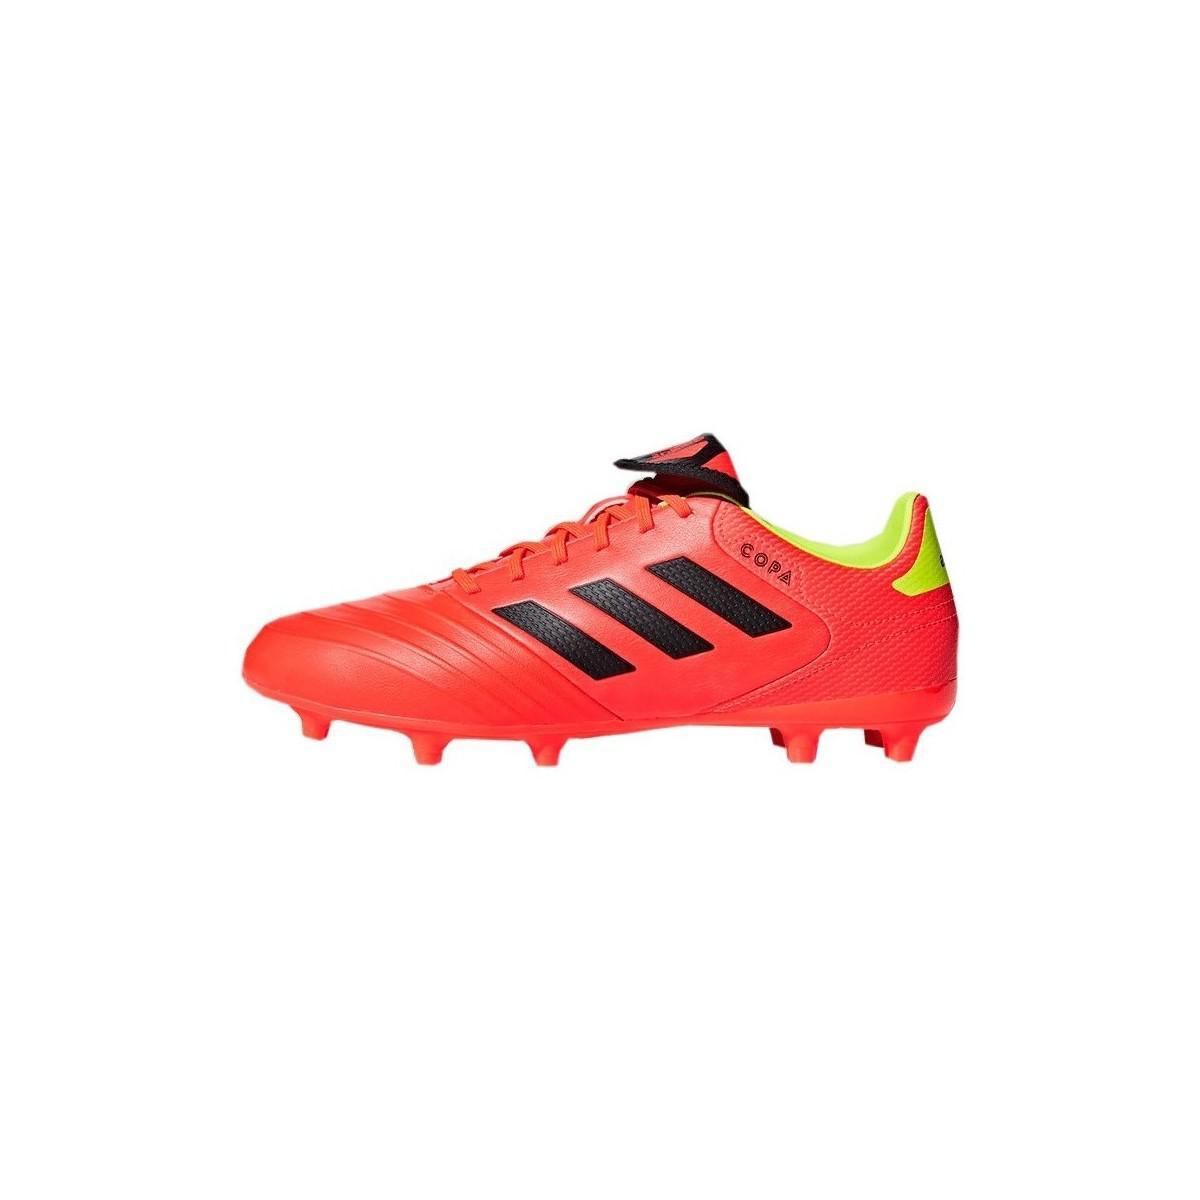 quality design 8123c 9d75d adidas Copa 183 Fg Mens Football Boots In Orange in Orange f